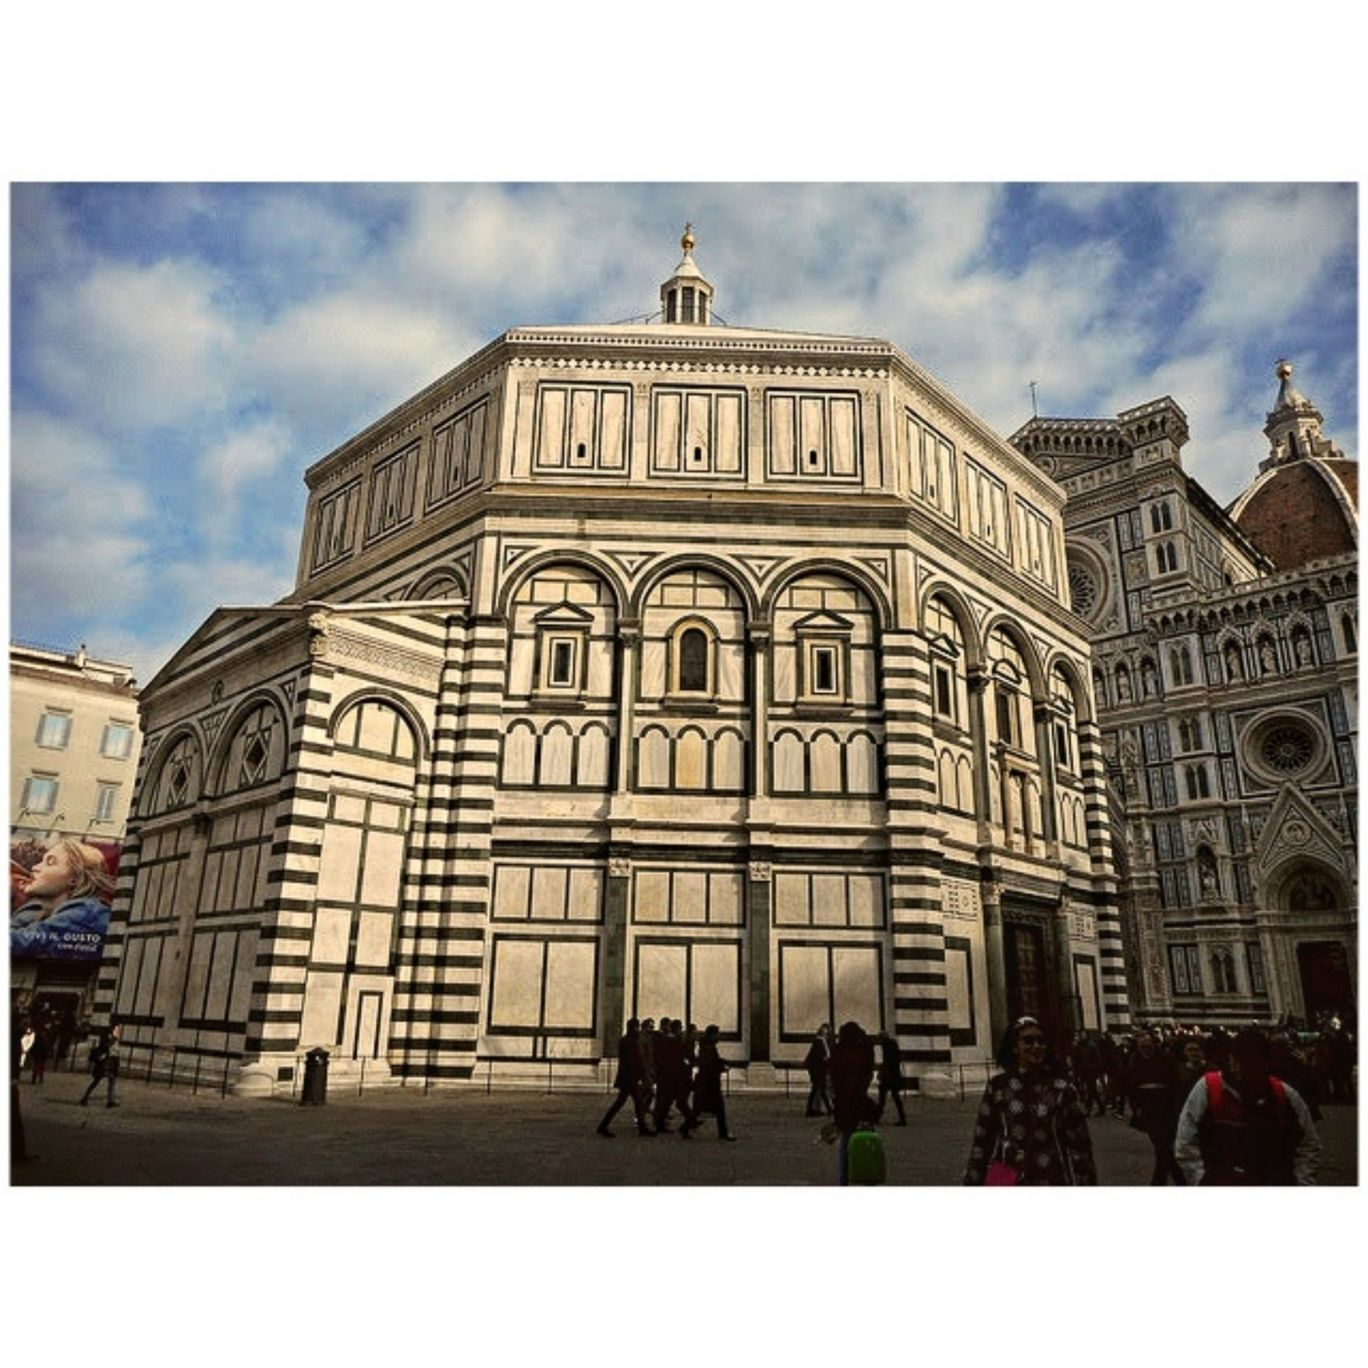 Photo of Florence By Abhi Vora